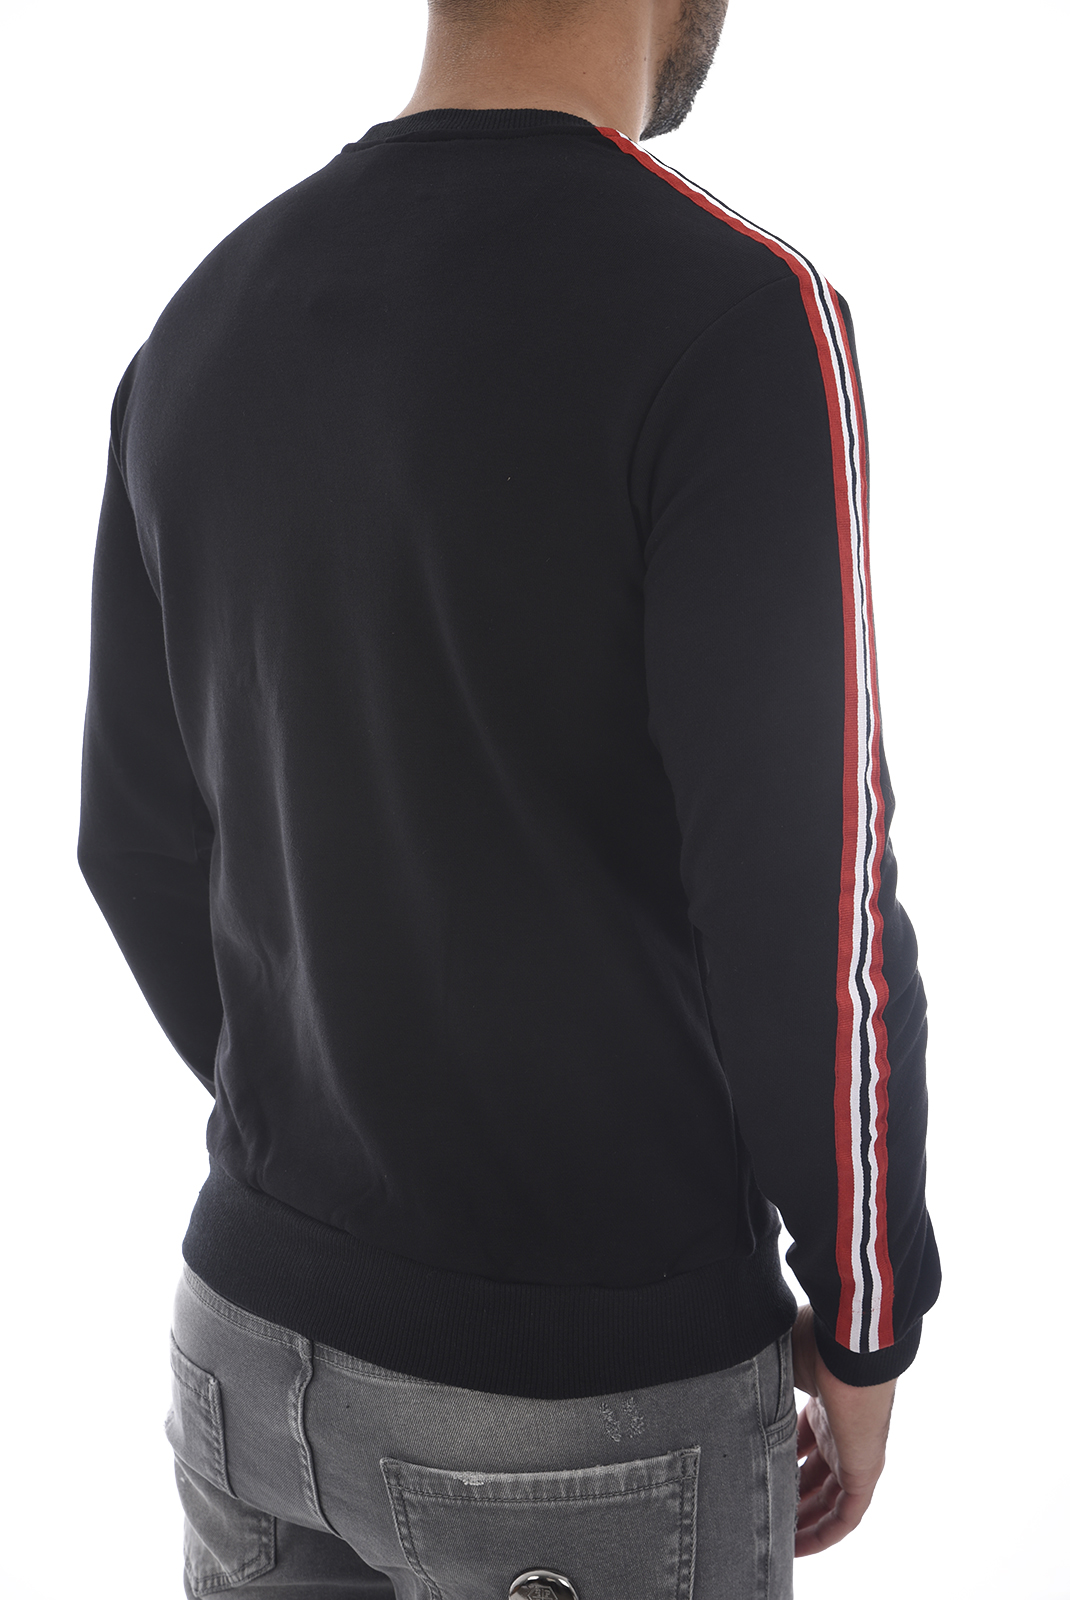 Sweatshirts  Goldenim paris 1006 NOIR